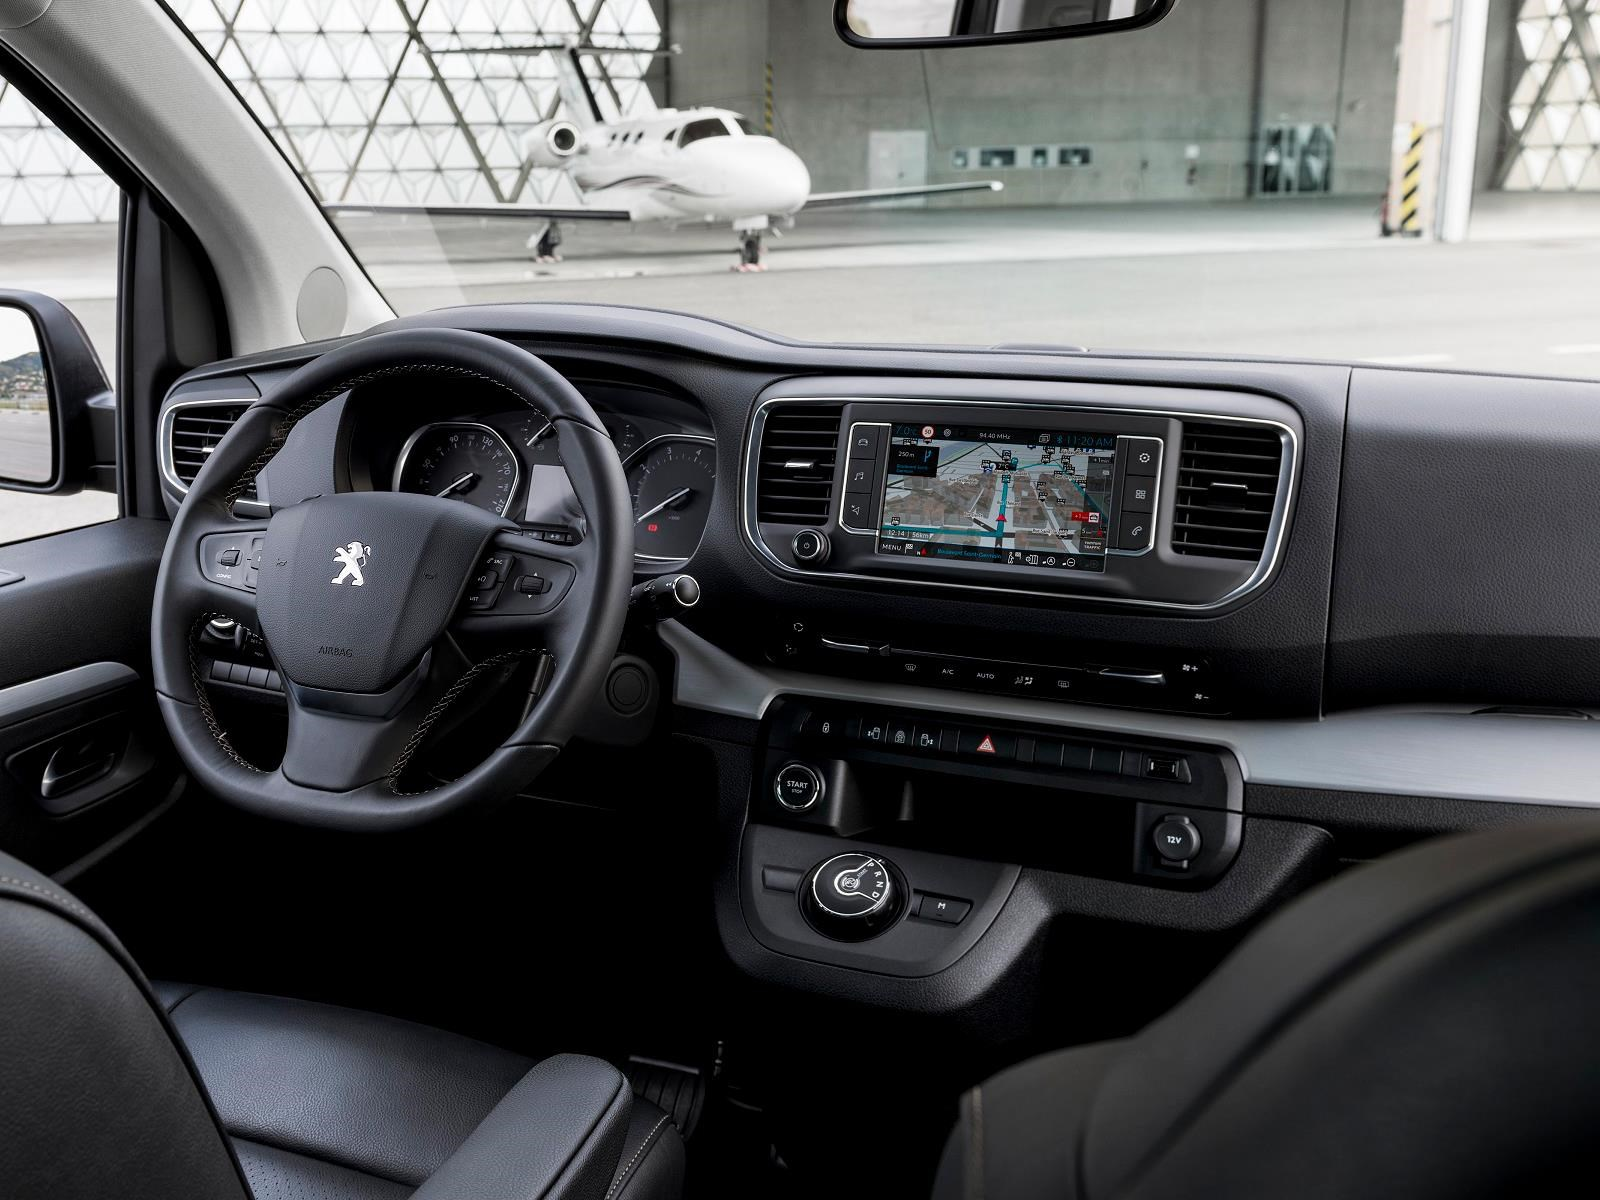 2017 Honda Odyssey >> Peugeot Traveller 2018 debuta - Autocosmos.com